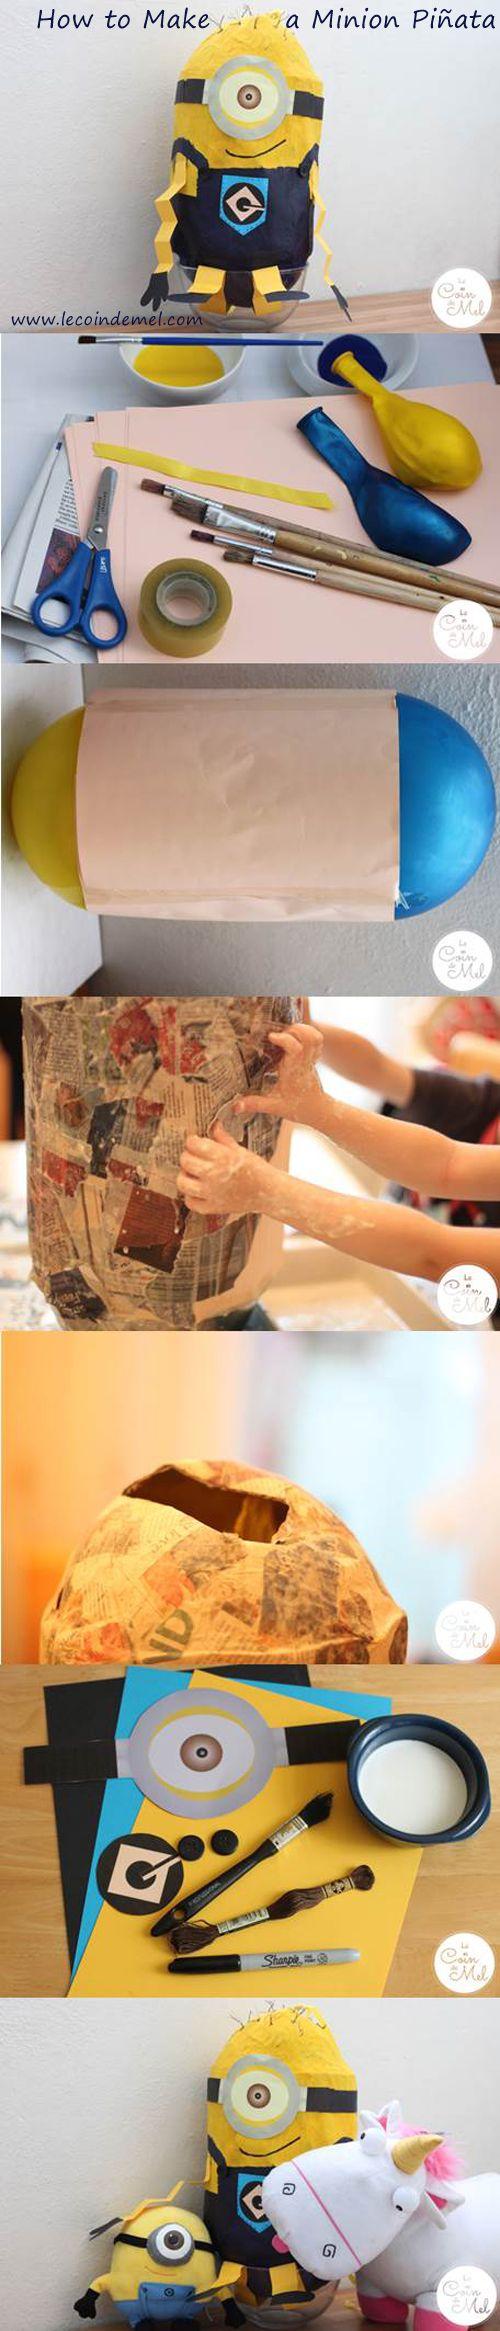 How to Make a Minion Piñata (Despicable Me) - easy tutorial for a piñata - www.lecoindemel.com